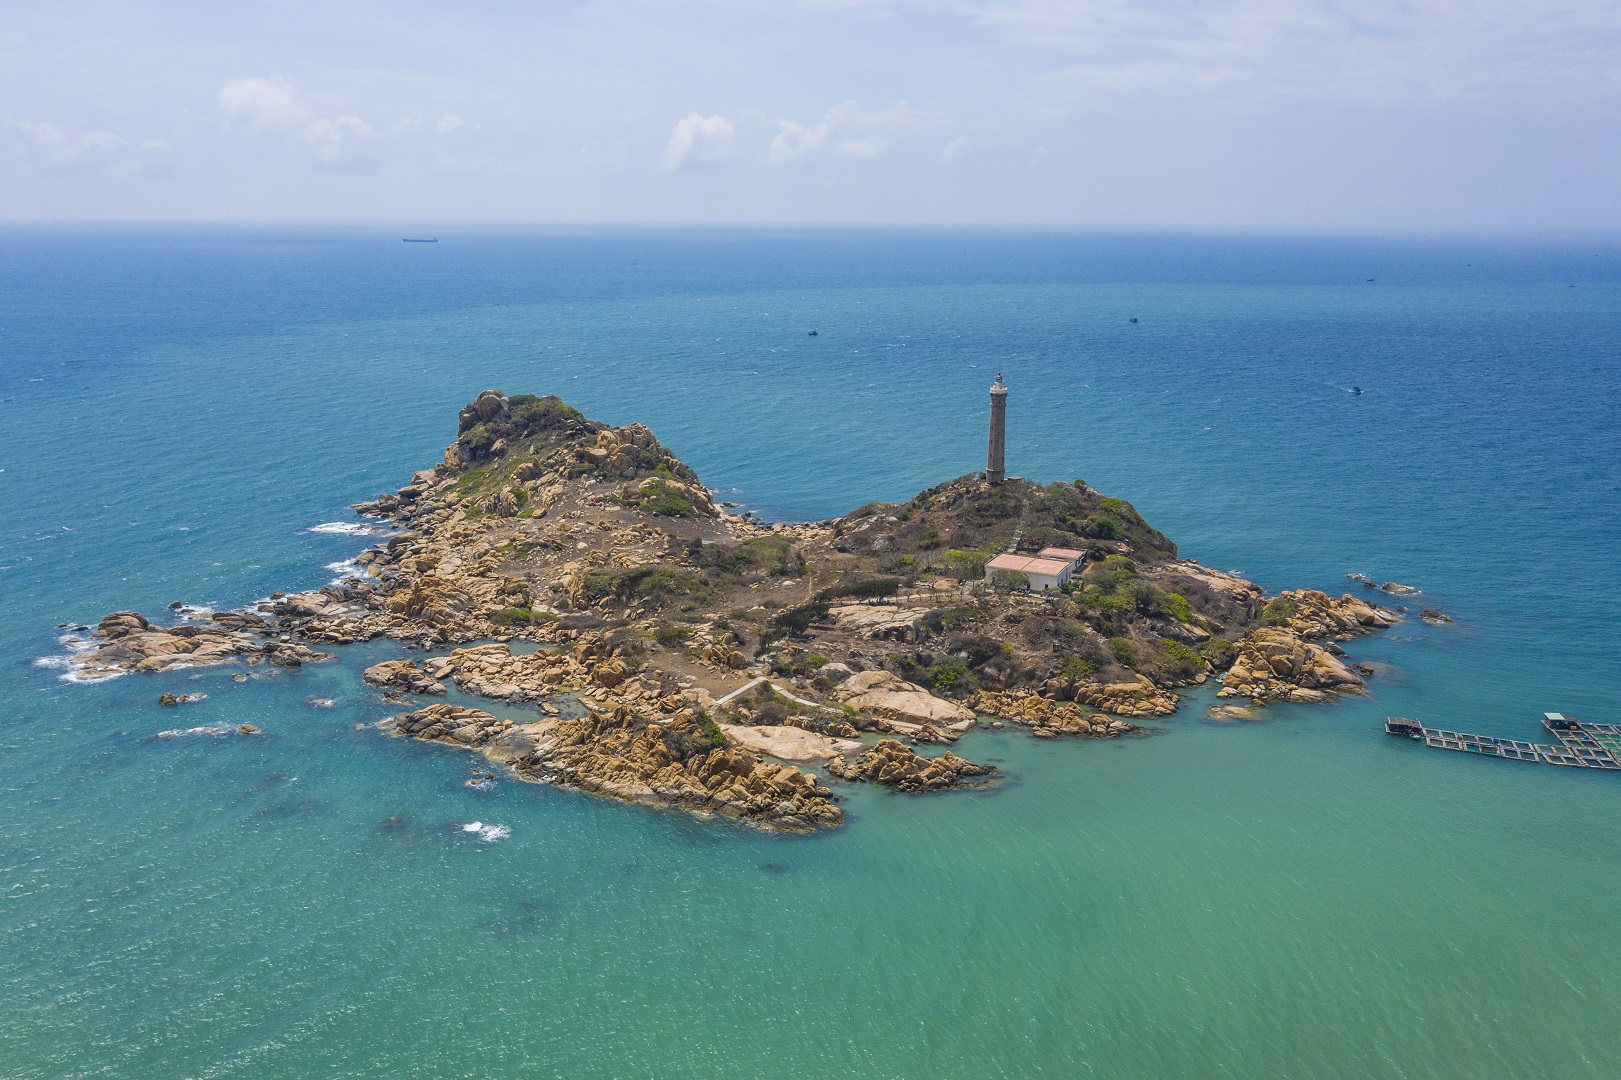 Vietnam's coastal central region looks stunning in these aerial photos